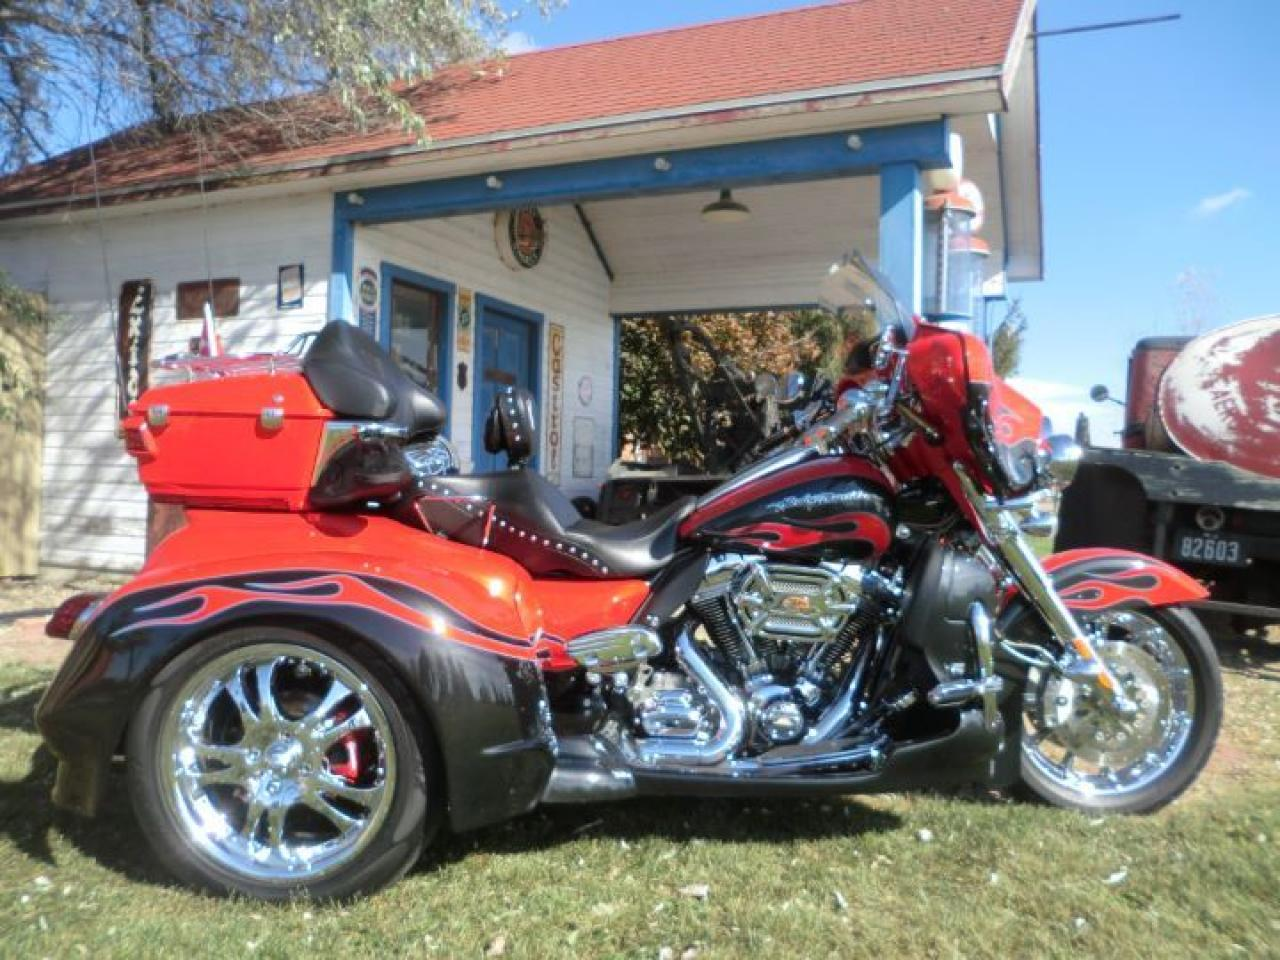 2010 Harley-Davidson Touring FLHTCUSE CVO TRIKE